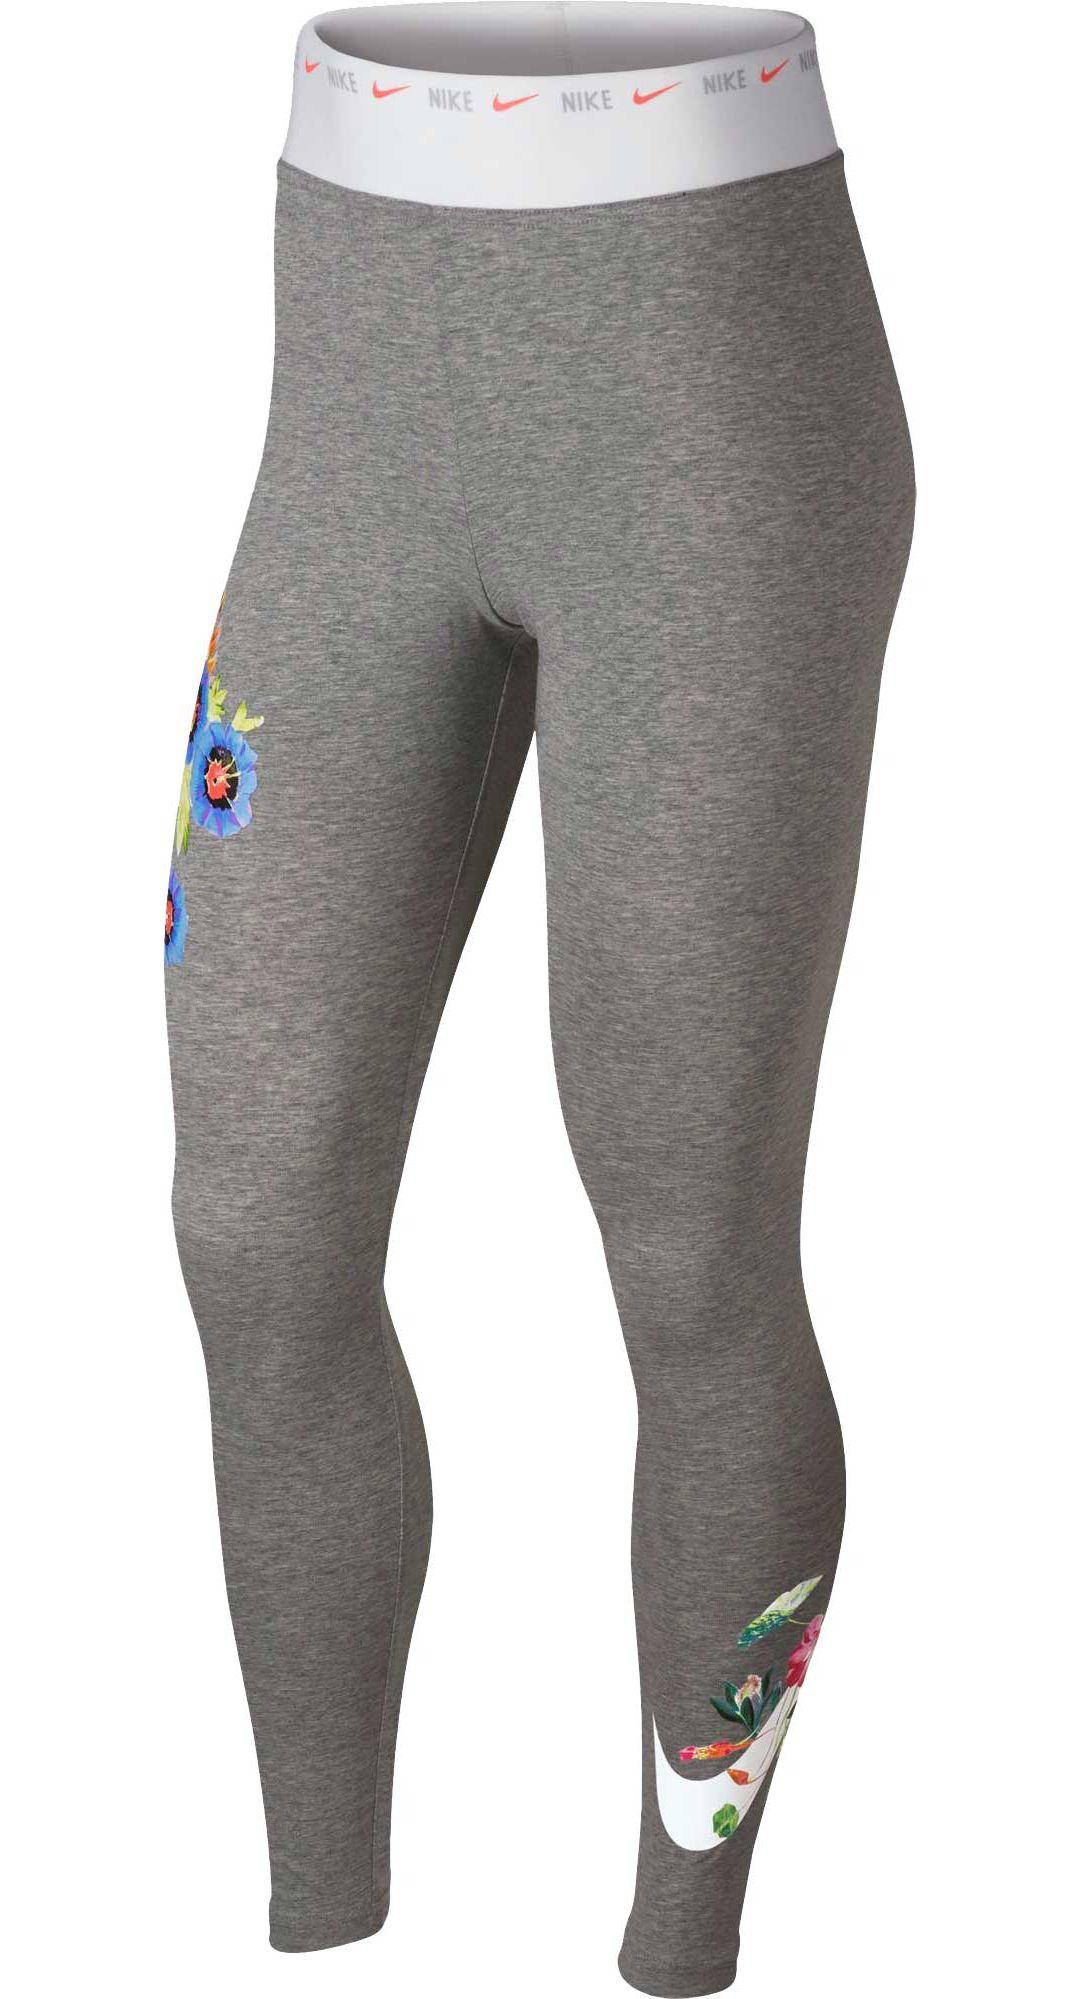 7a8e39ece57fc Nike Women's Sportswear Leg-A-See Femme Leggings. noImageFound. Previous